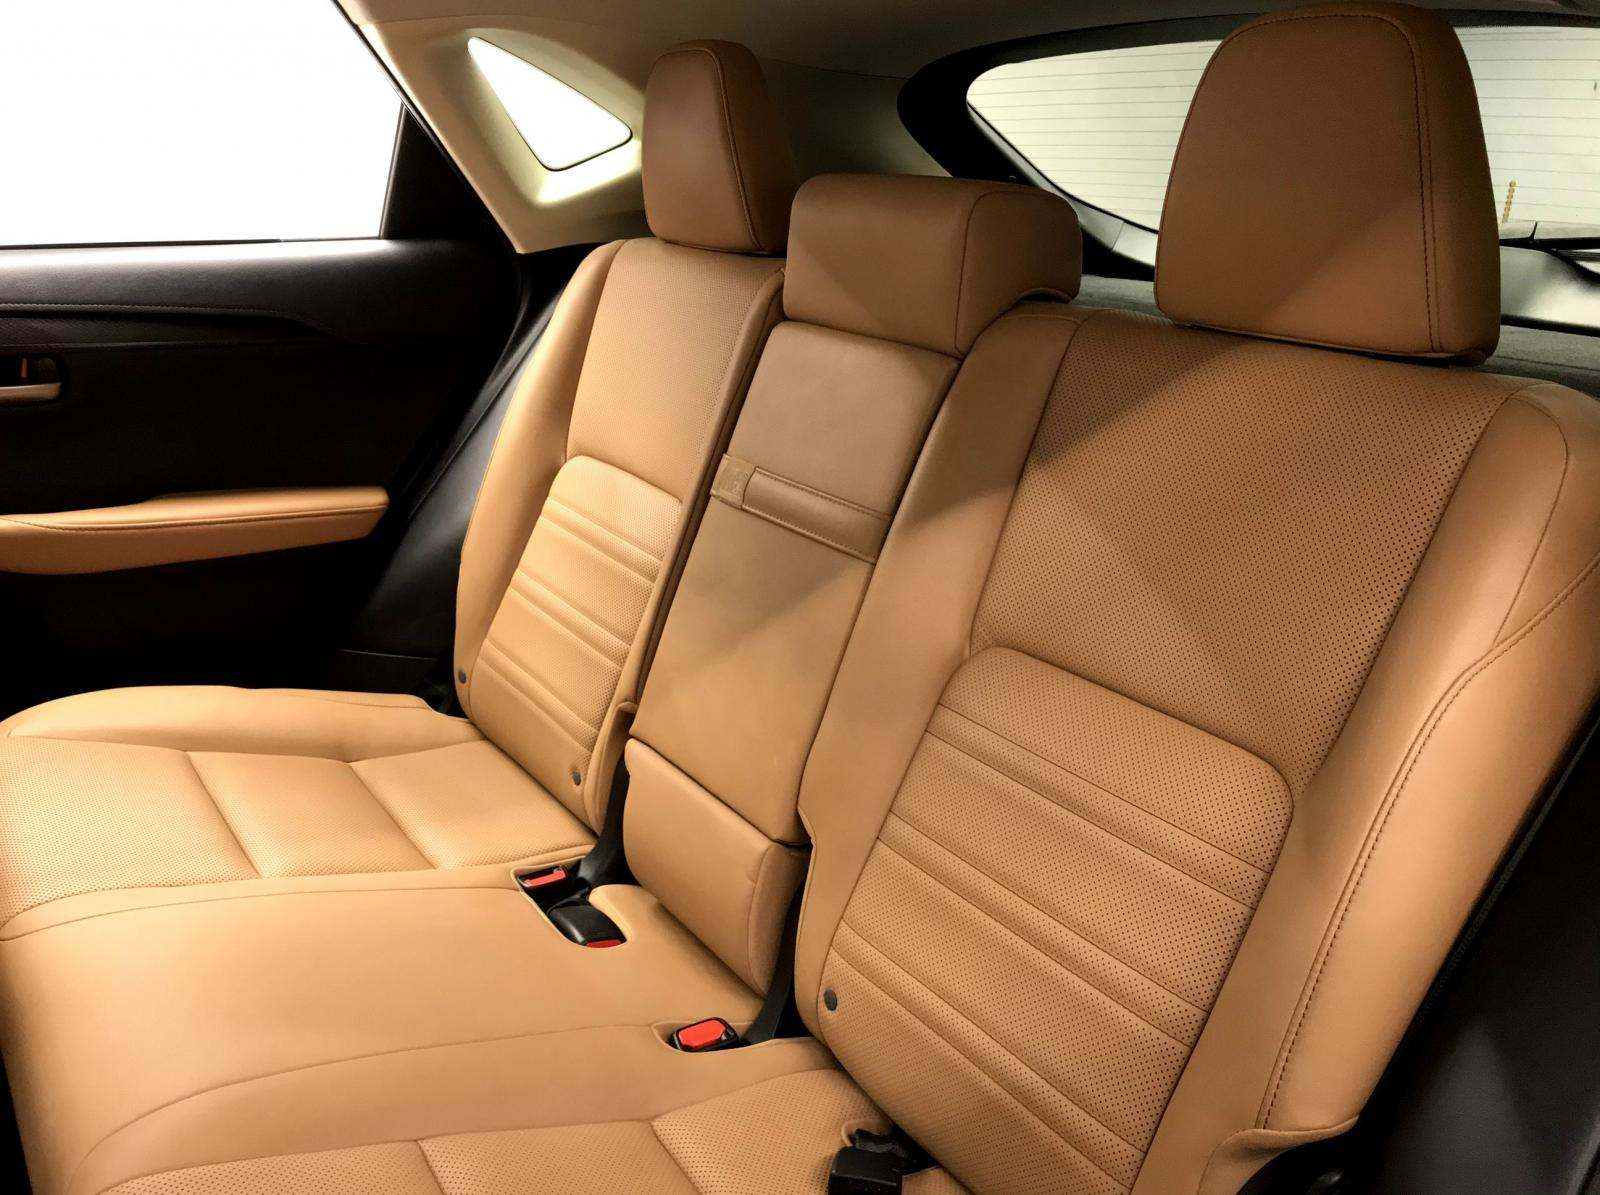 used Lexus NX 2015 vin: JTJBARBZ9F2000806